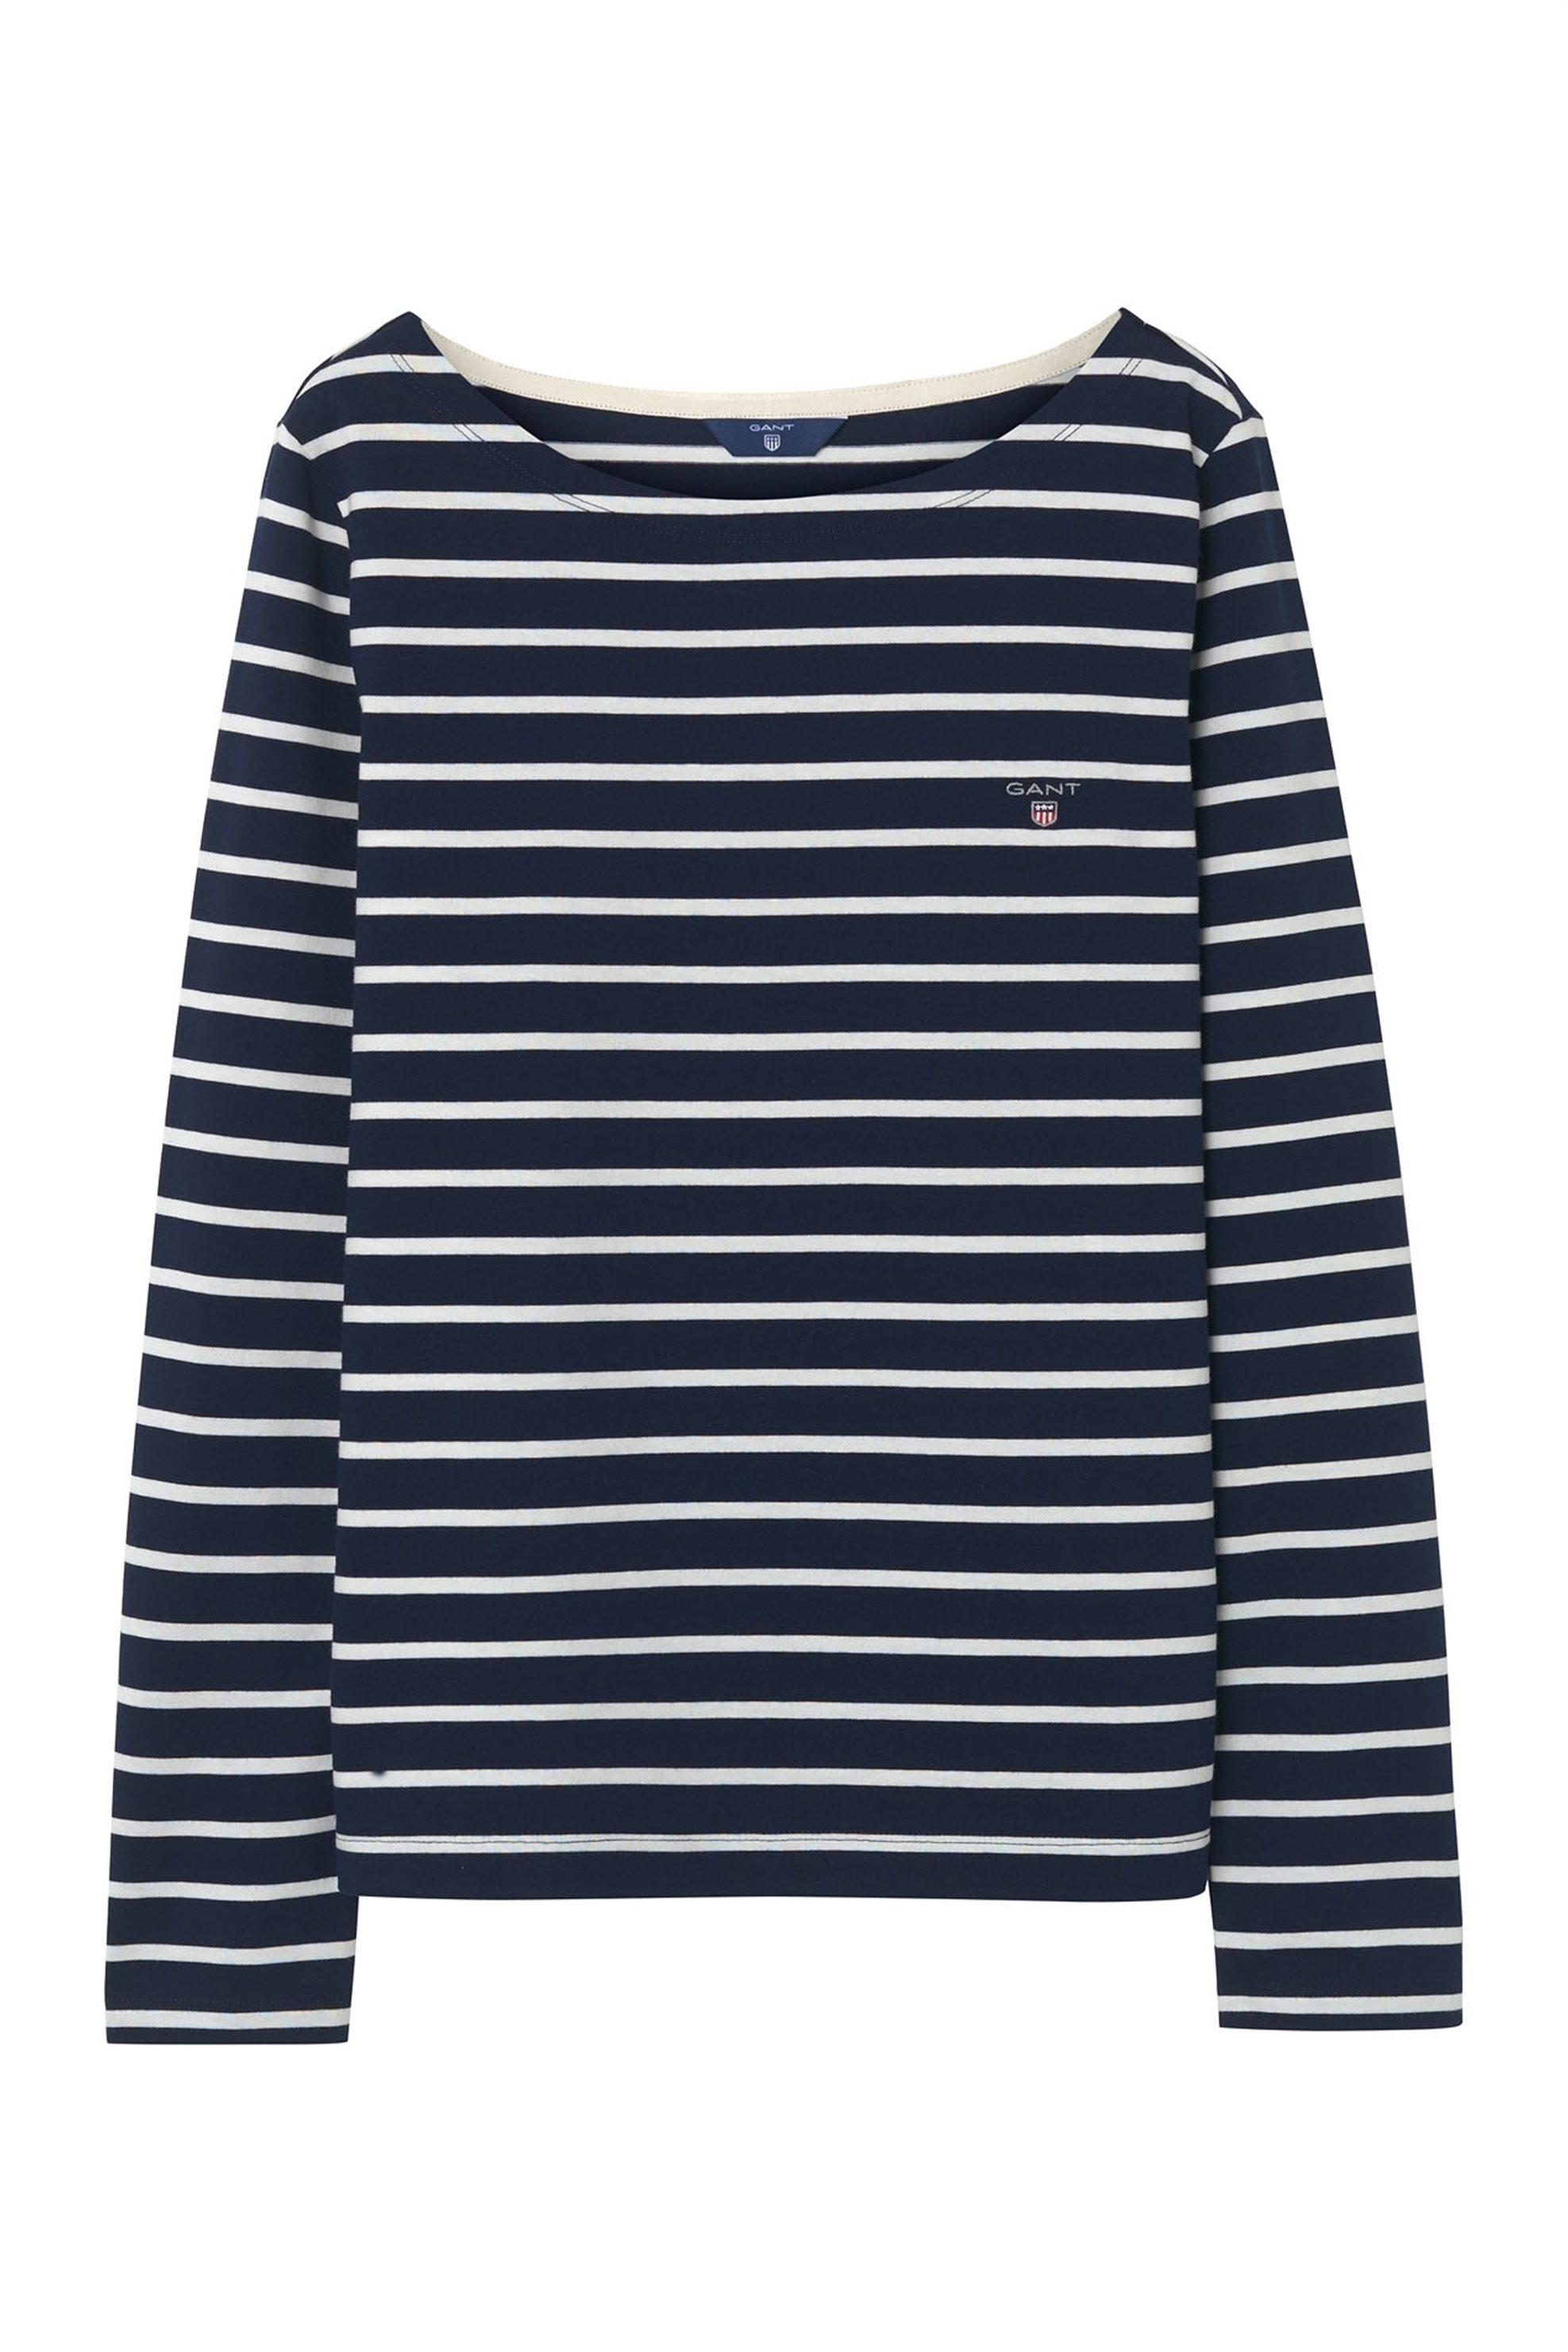 Gant γυναικεία μπλούζα ριγέ Breton Stripe - 4202401 - Μπλε Σκούρο γυναικα   ρουχα   tops   μπλούζες   casual